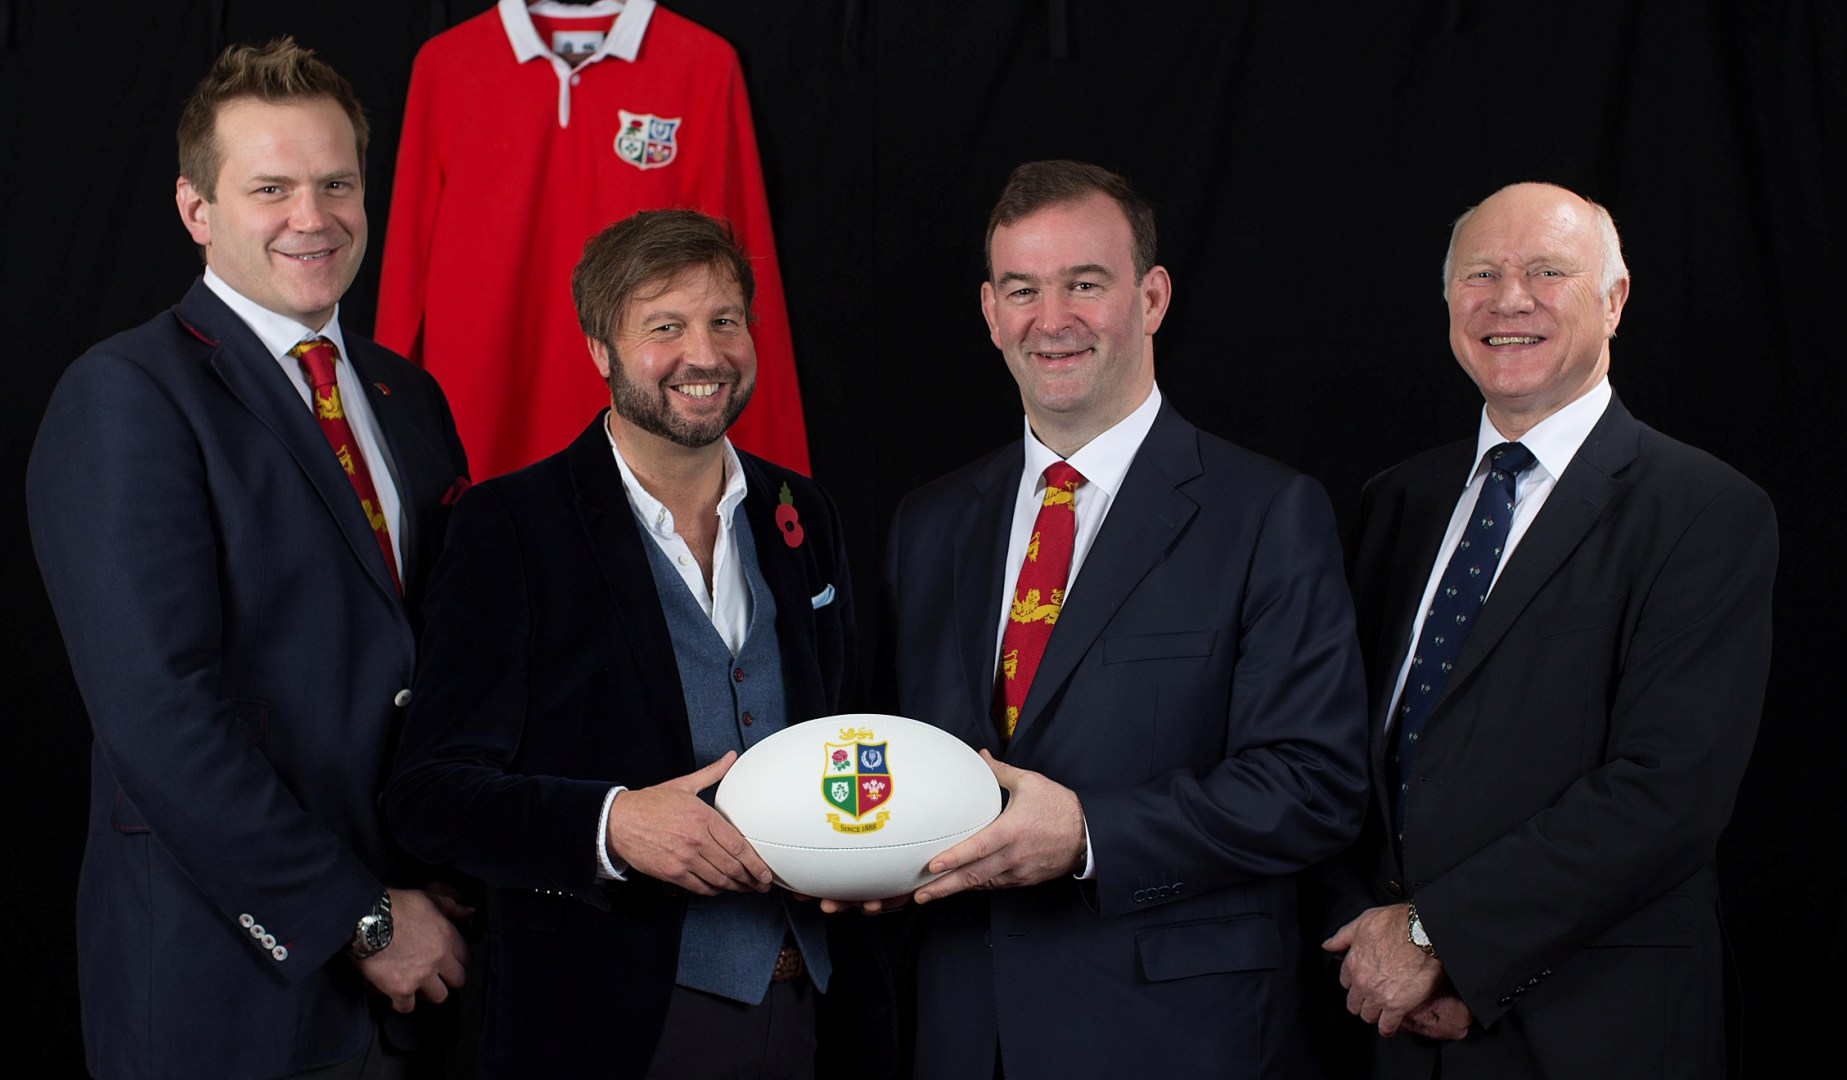 British & Irish Lions announce Canterbury as official apparel partner